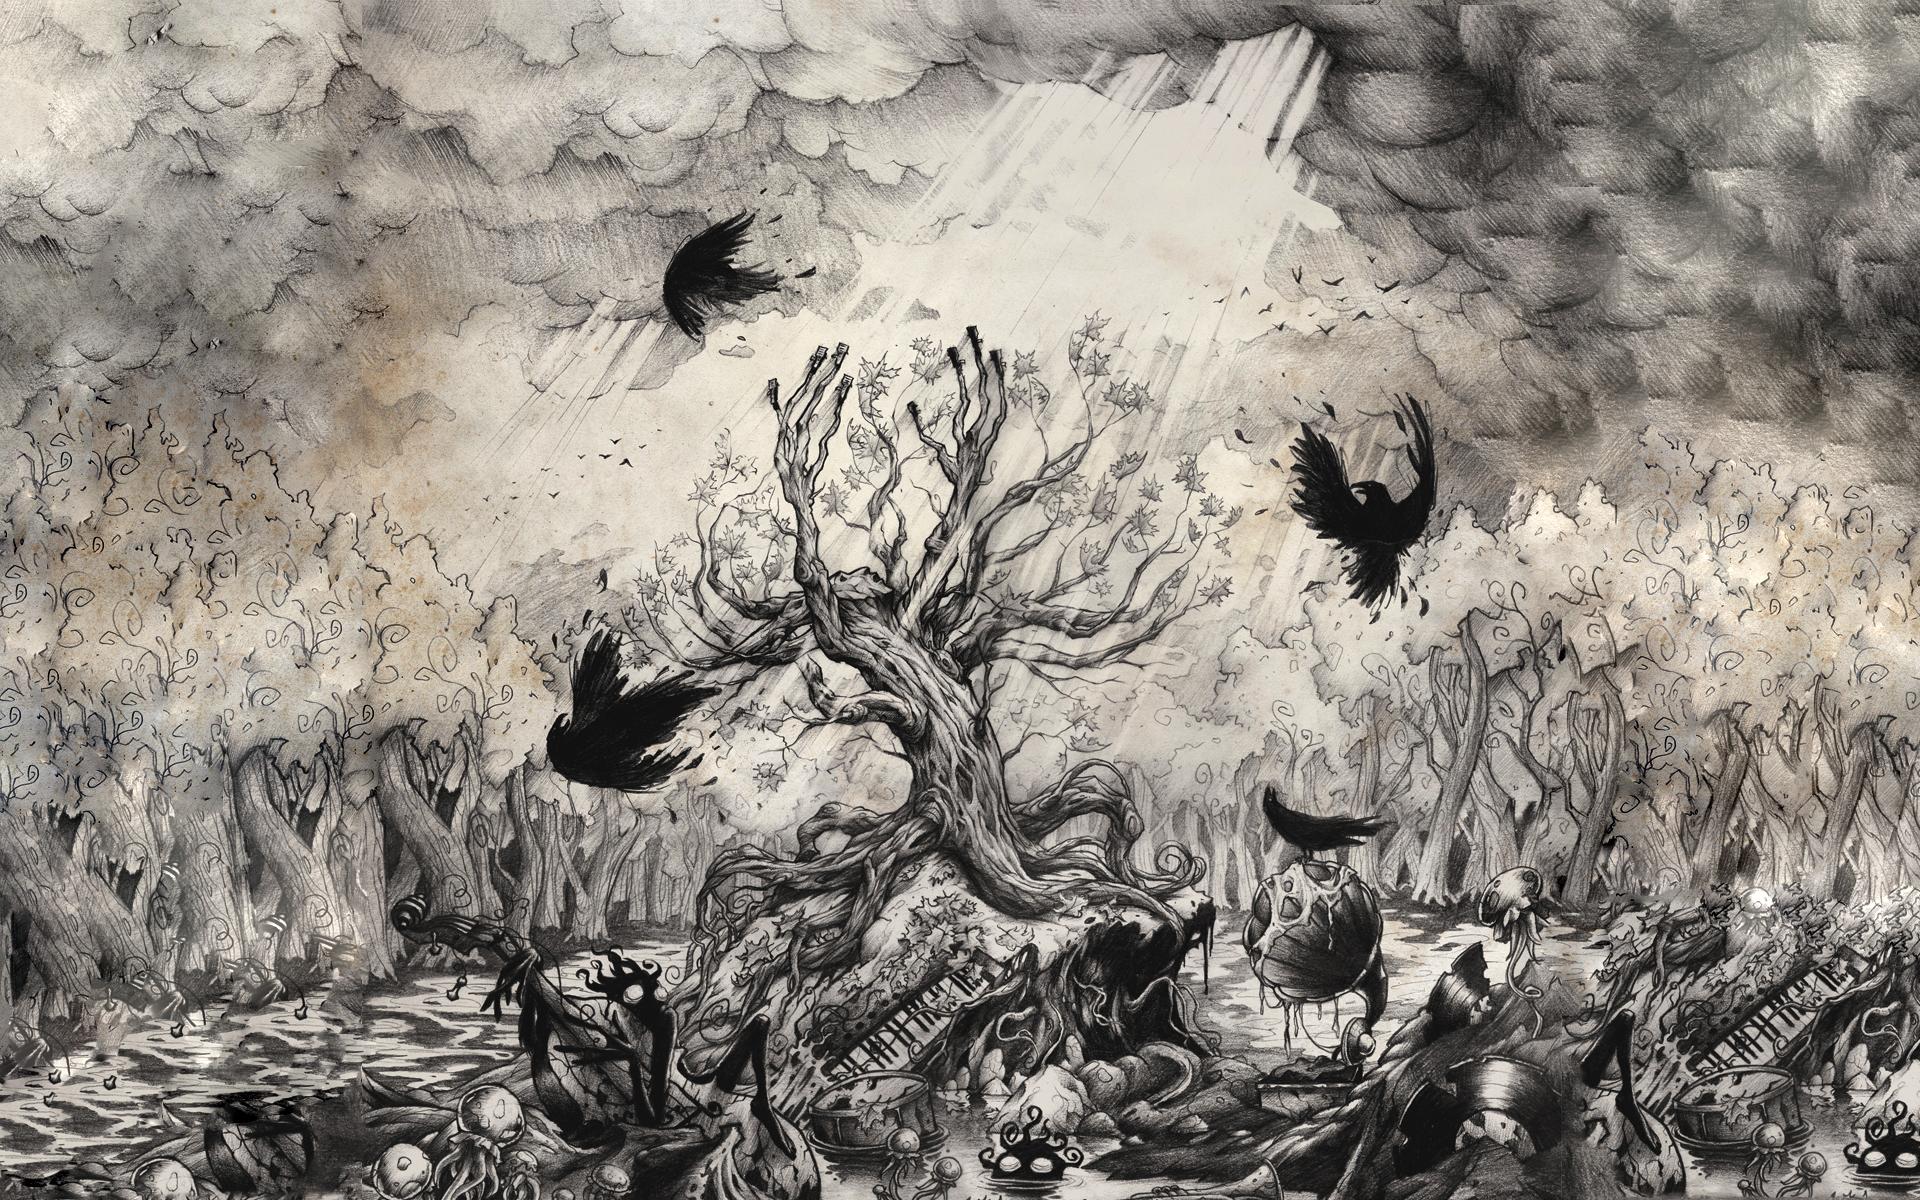 Drawn raven spooky Spooky animal WallpaperUP 1920x1200 dark